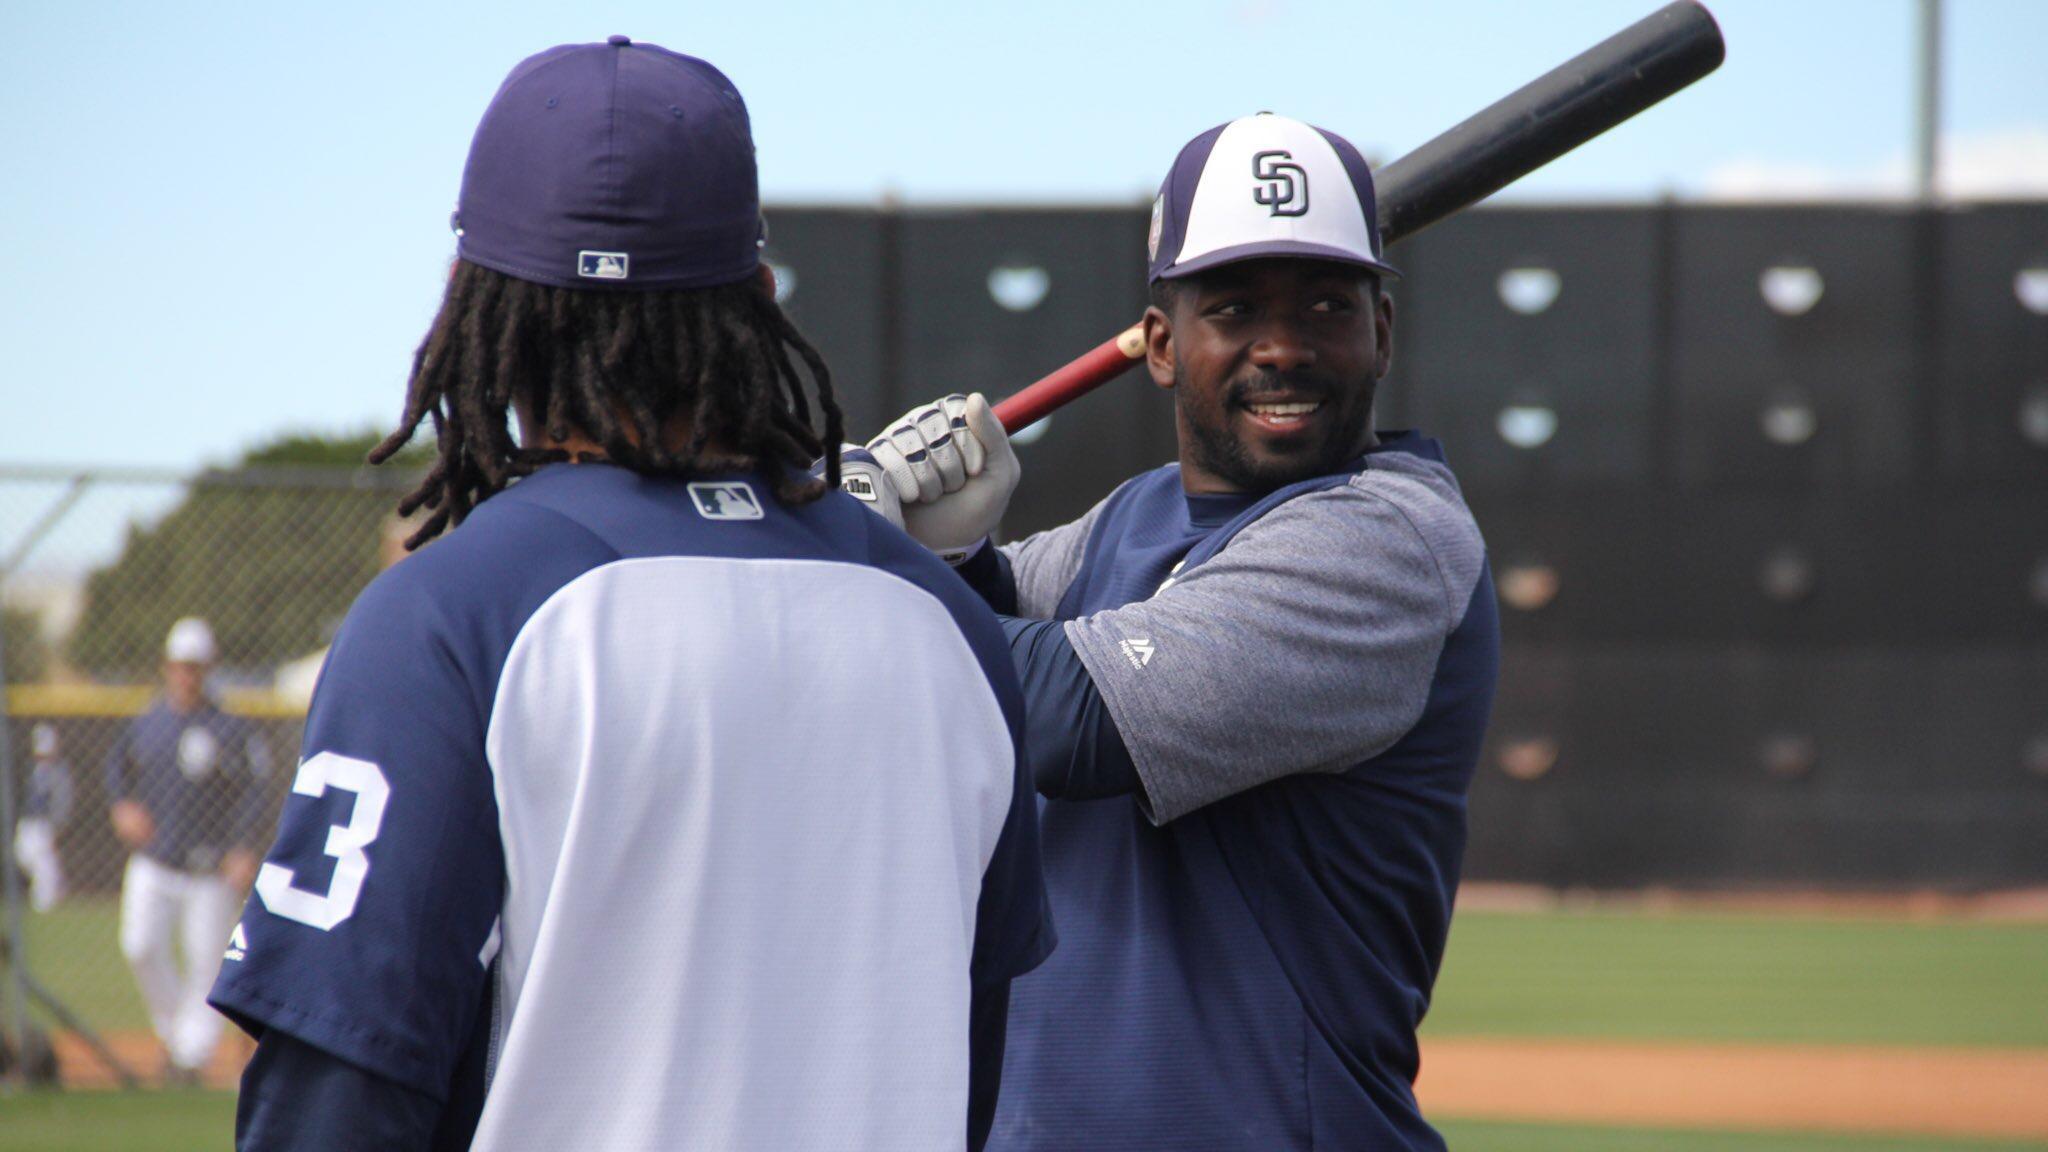 Freddy Galvis, Jose Pirela bonding with Padres